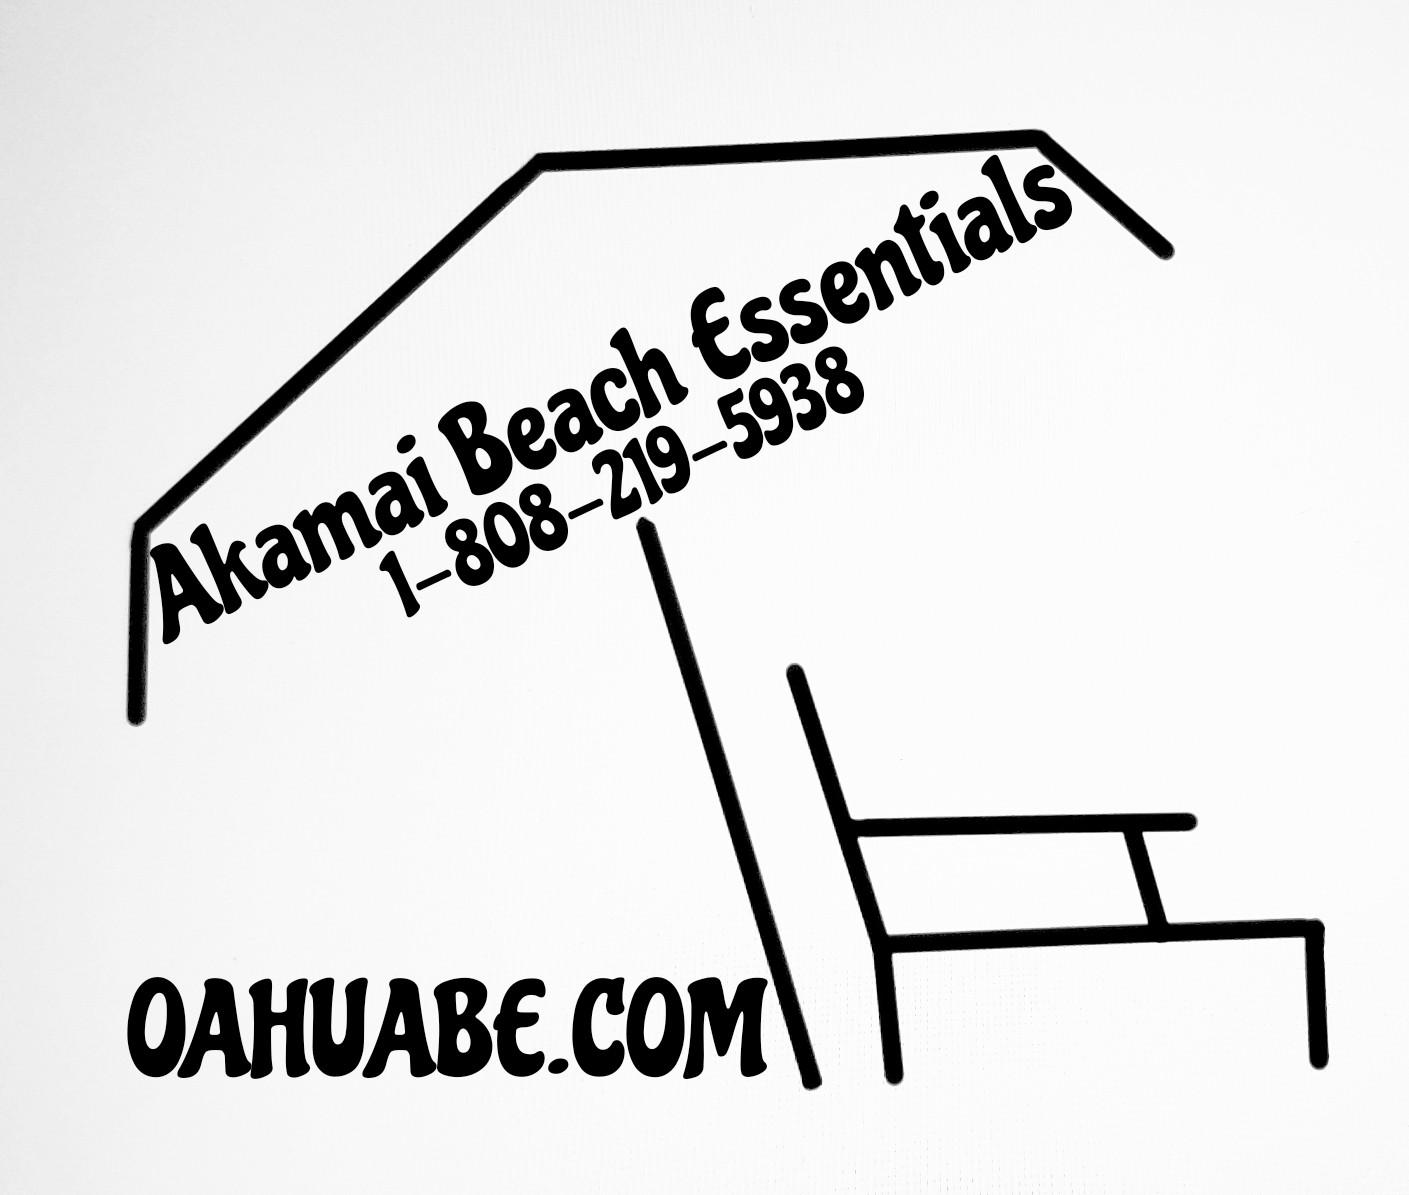 Akamai Beach Essentials logo